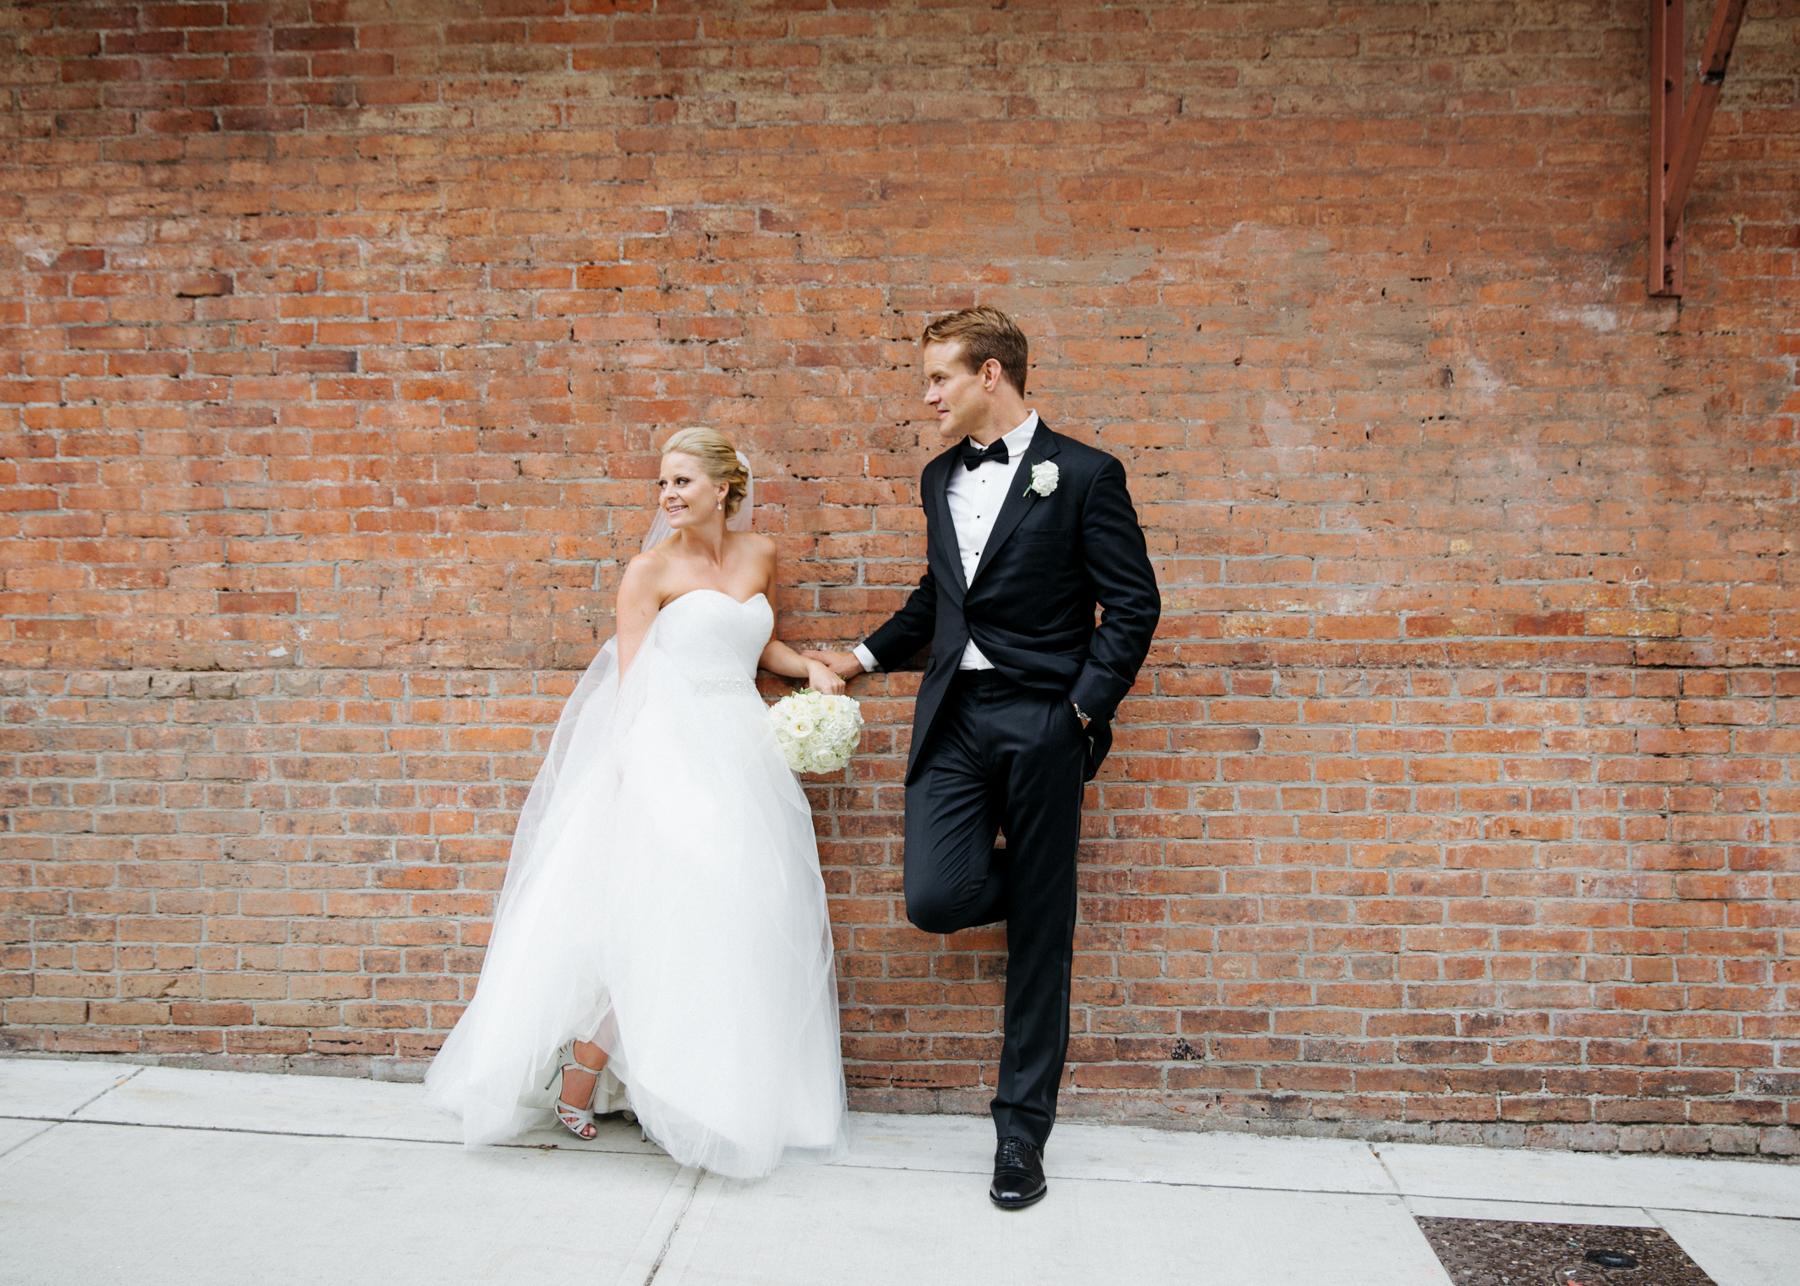 kaoverii_silva_photographer_via-herafilms_kelly_mike_wedding-16.jpg